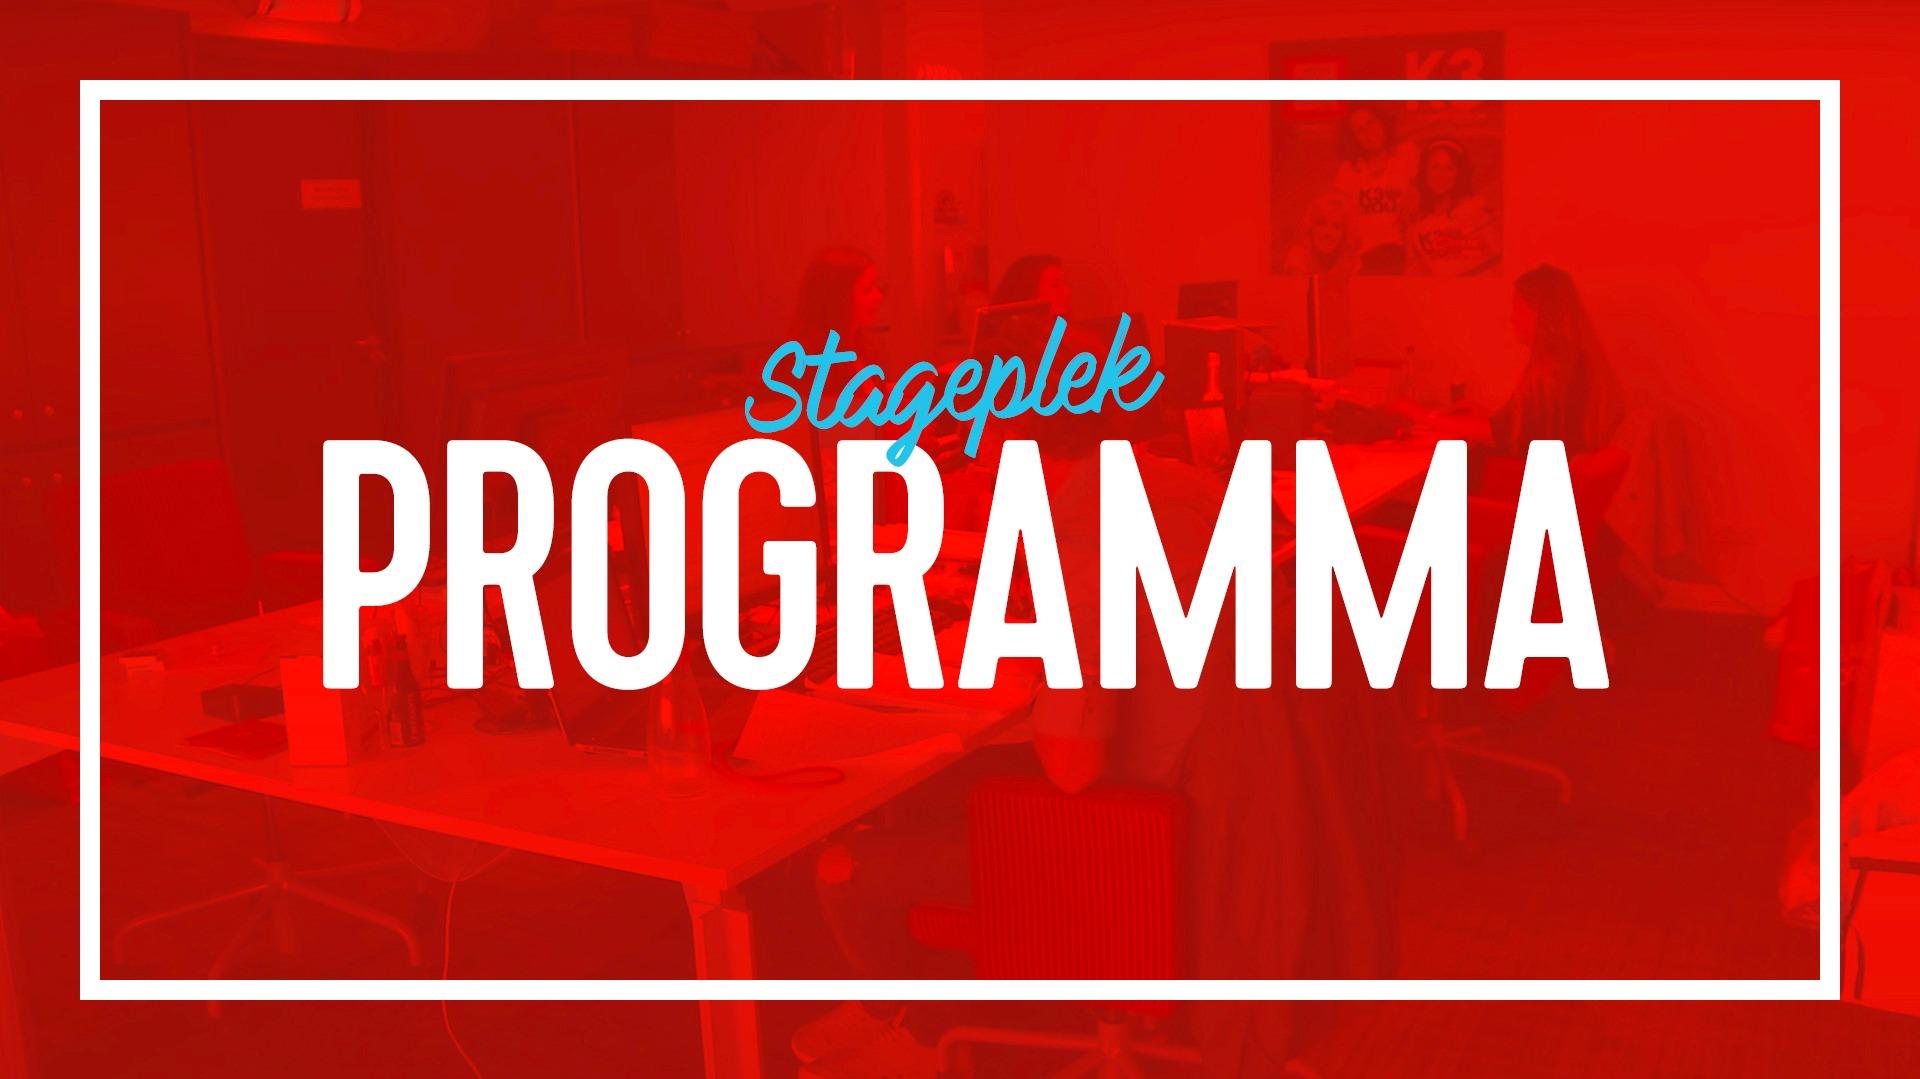 Stageplekken programma